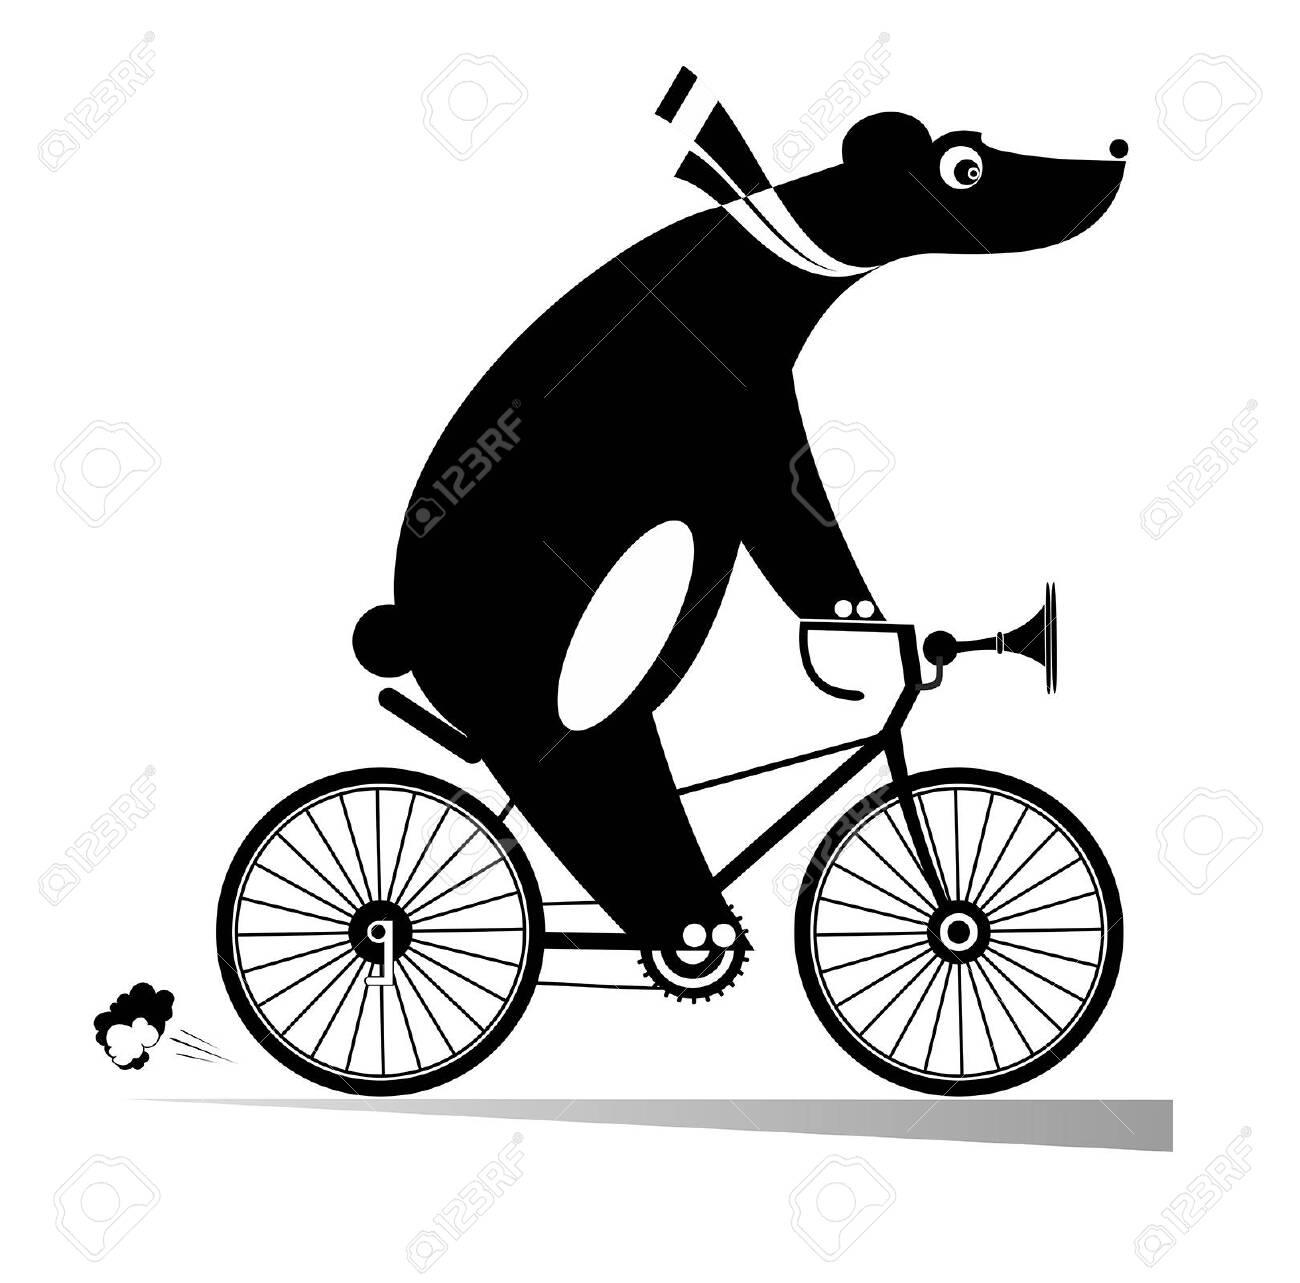 Funny bear rides a bike illustration. Cartoon bear rides a bicycle black on white illustration - 129733579